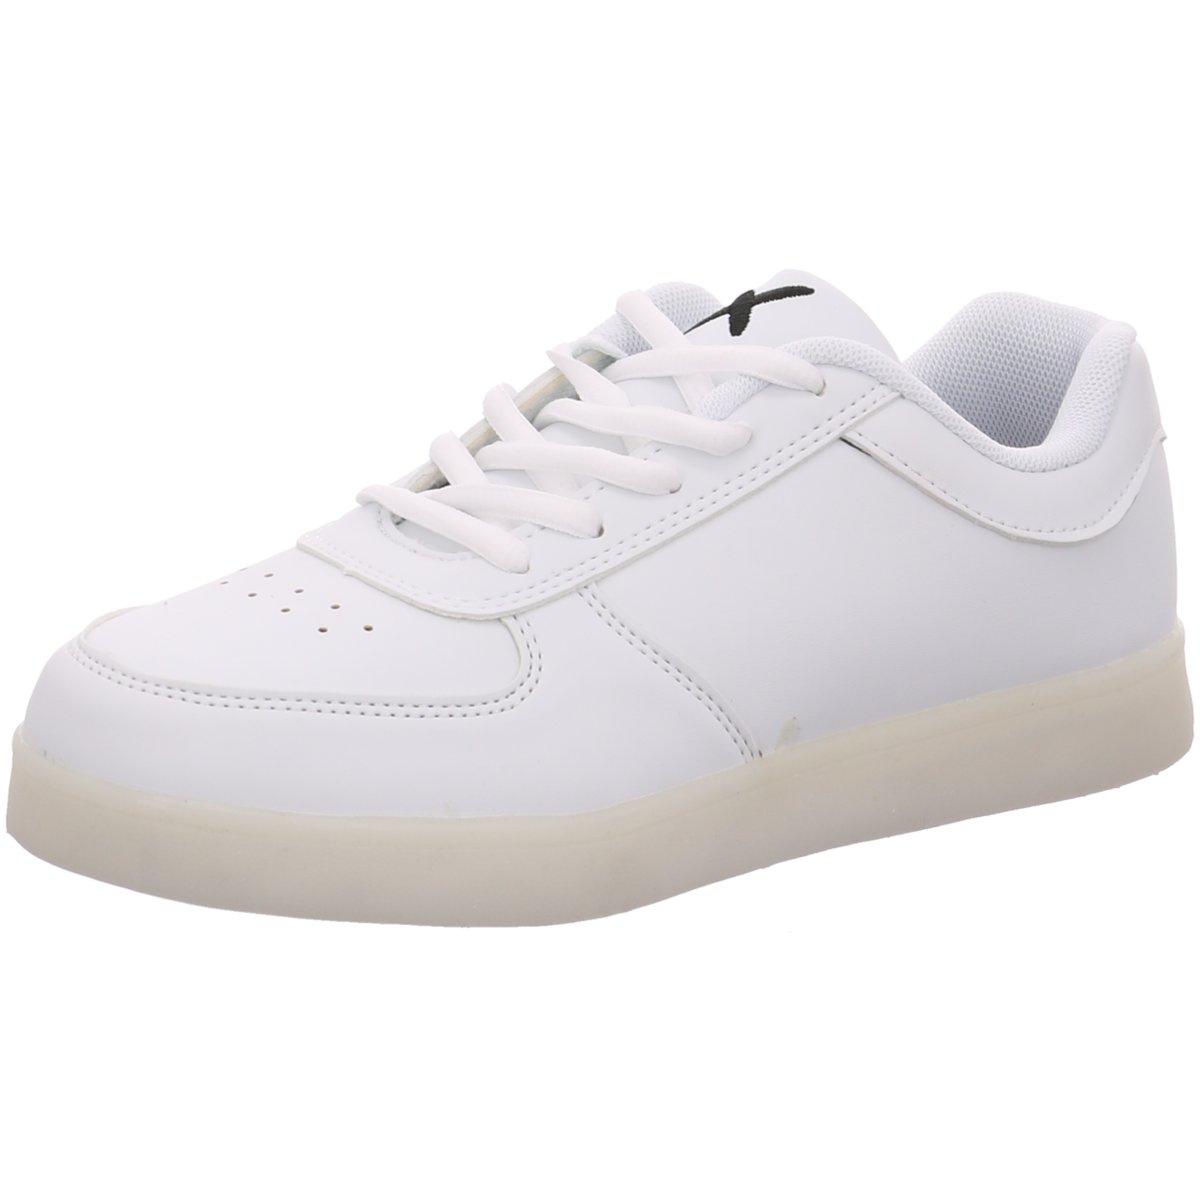 NEU Wize & Ope Damen Sneaker white LED-01 weiß 185967